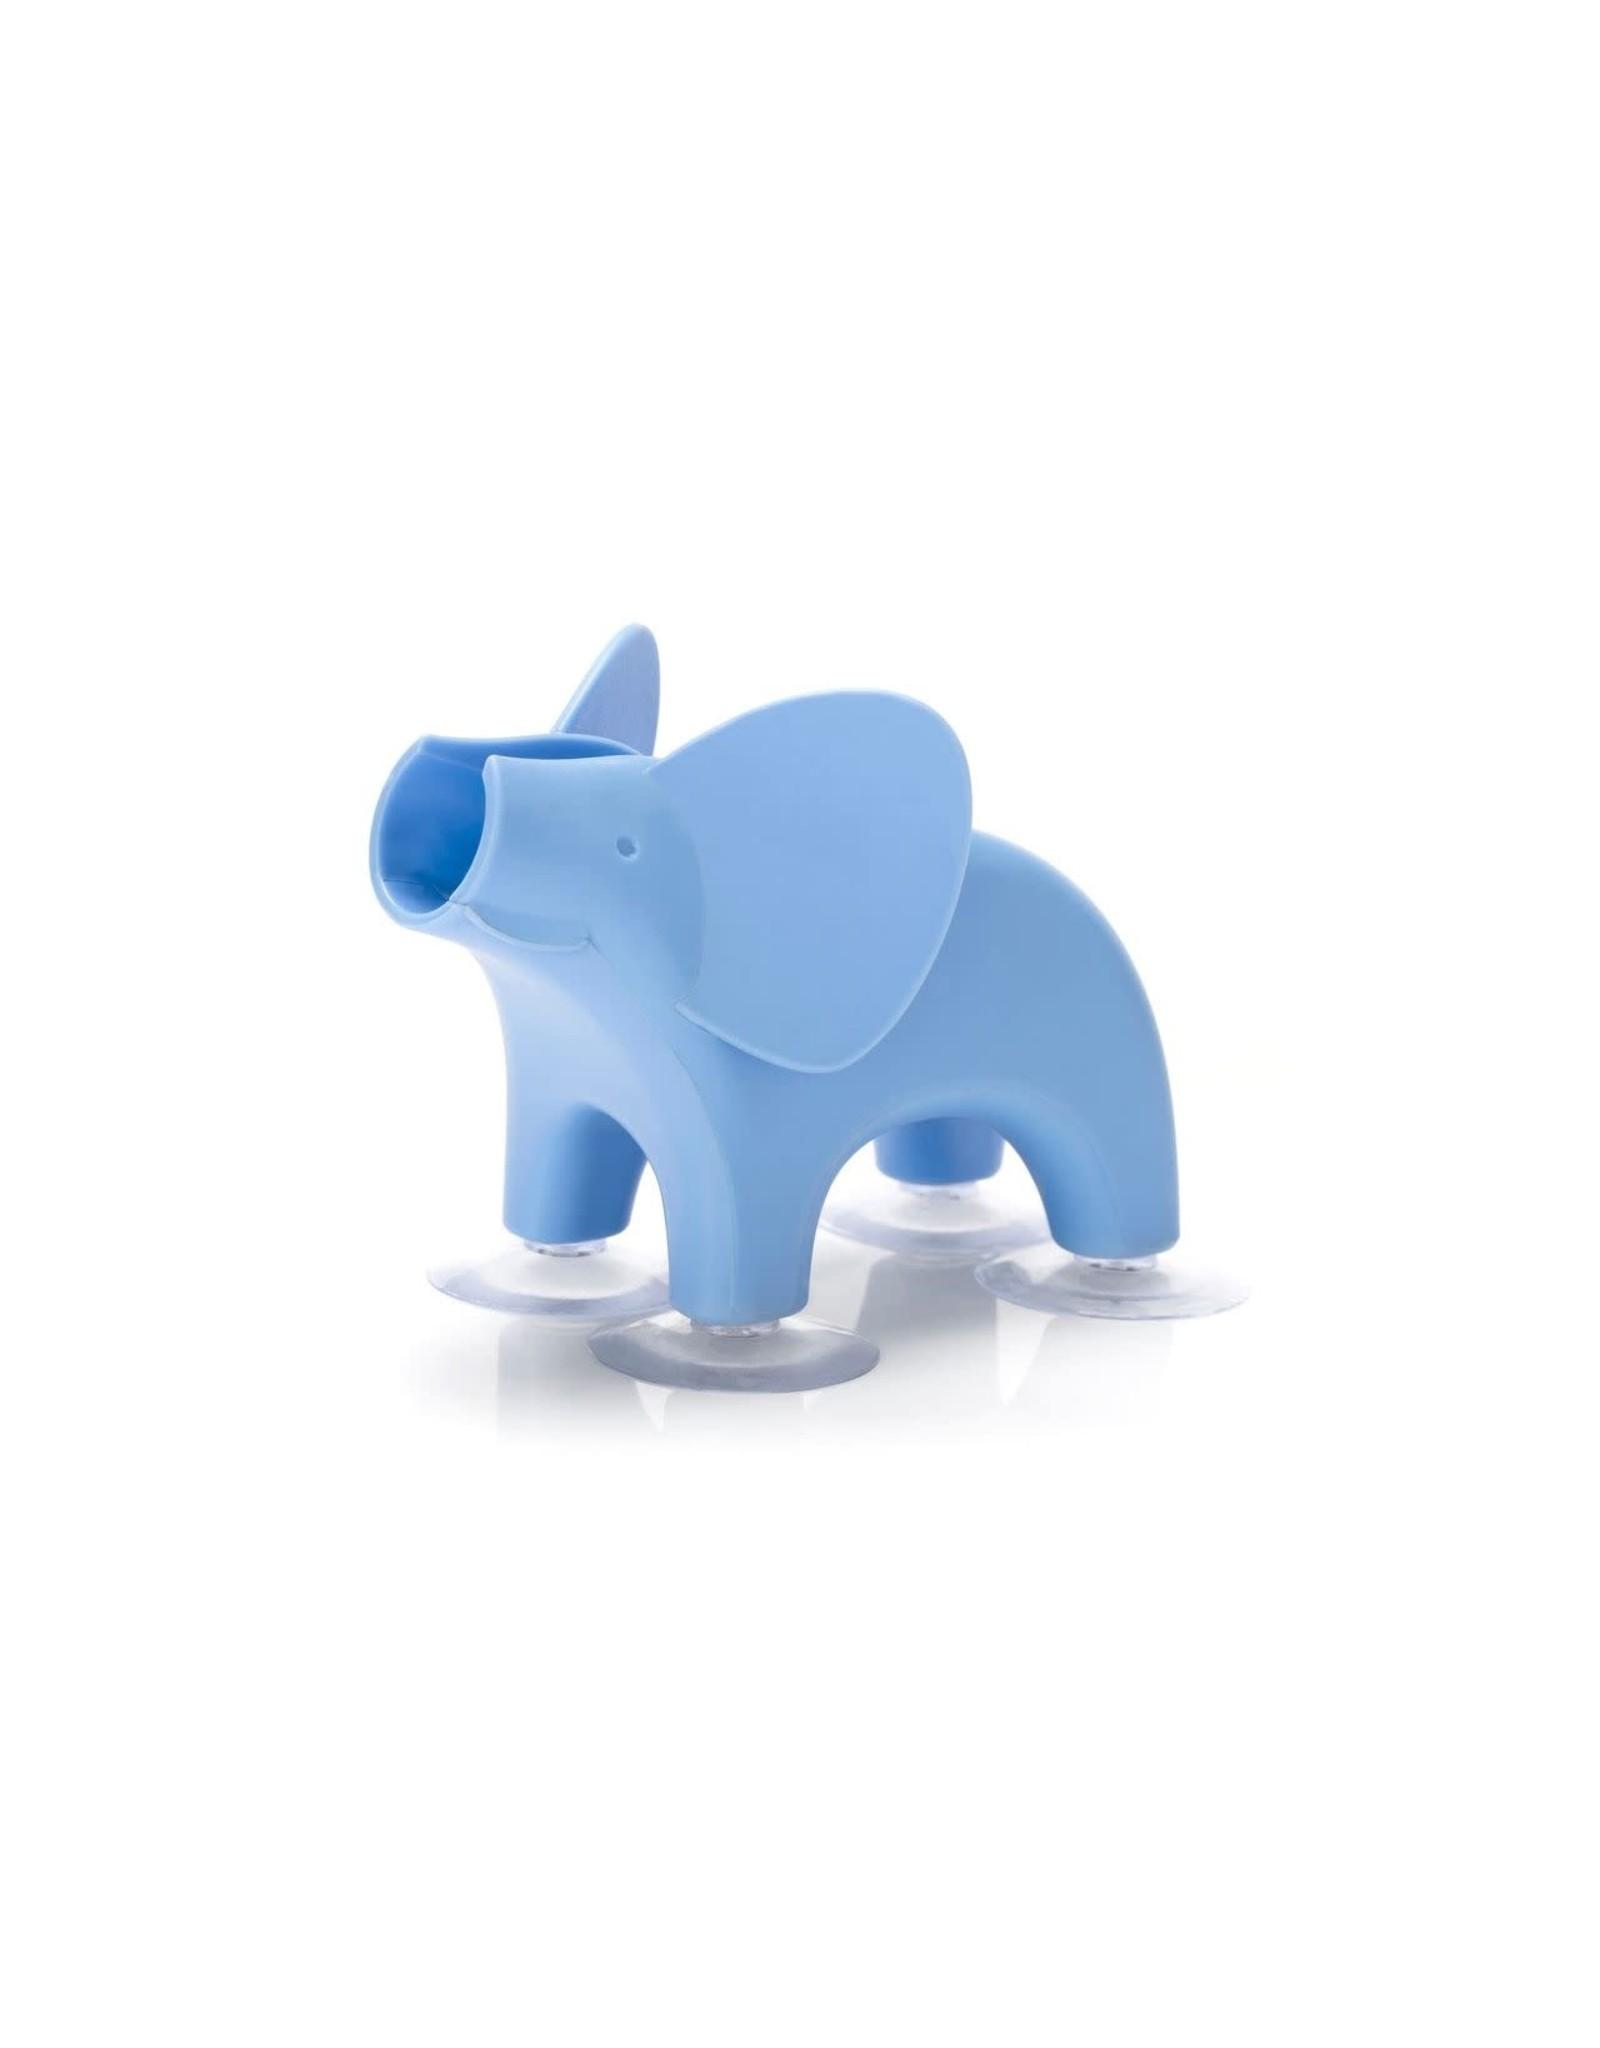 Peleg Design shower head holder shaped like an elephant